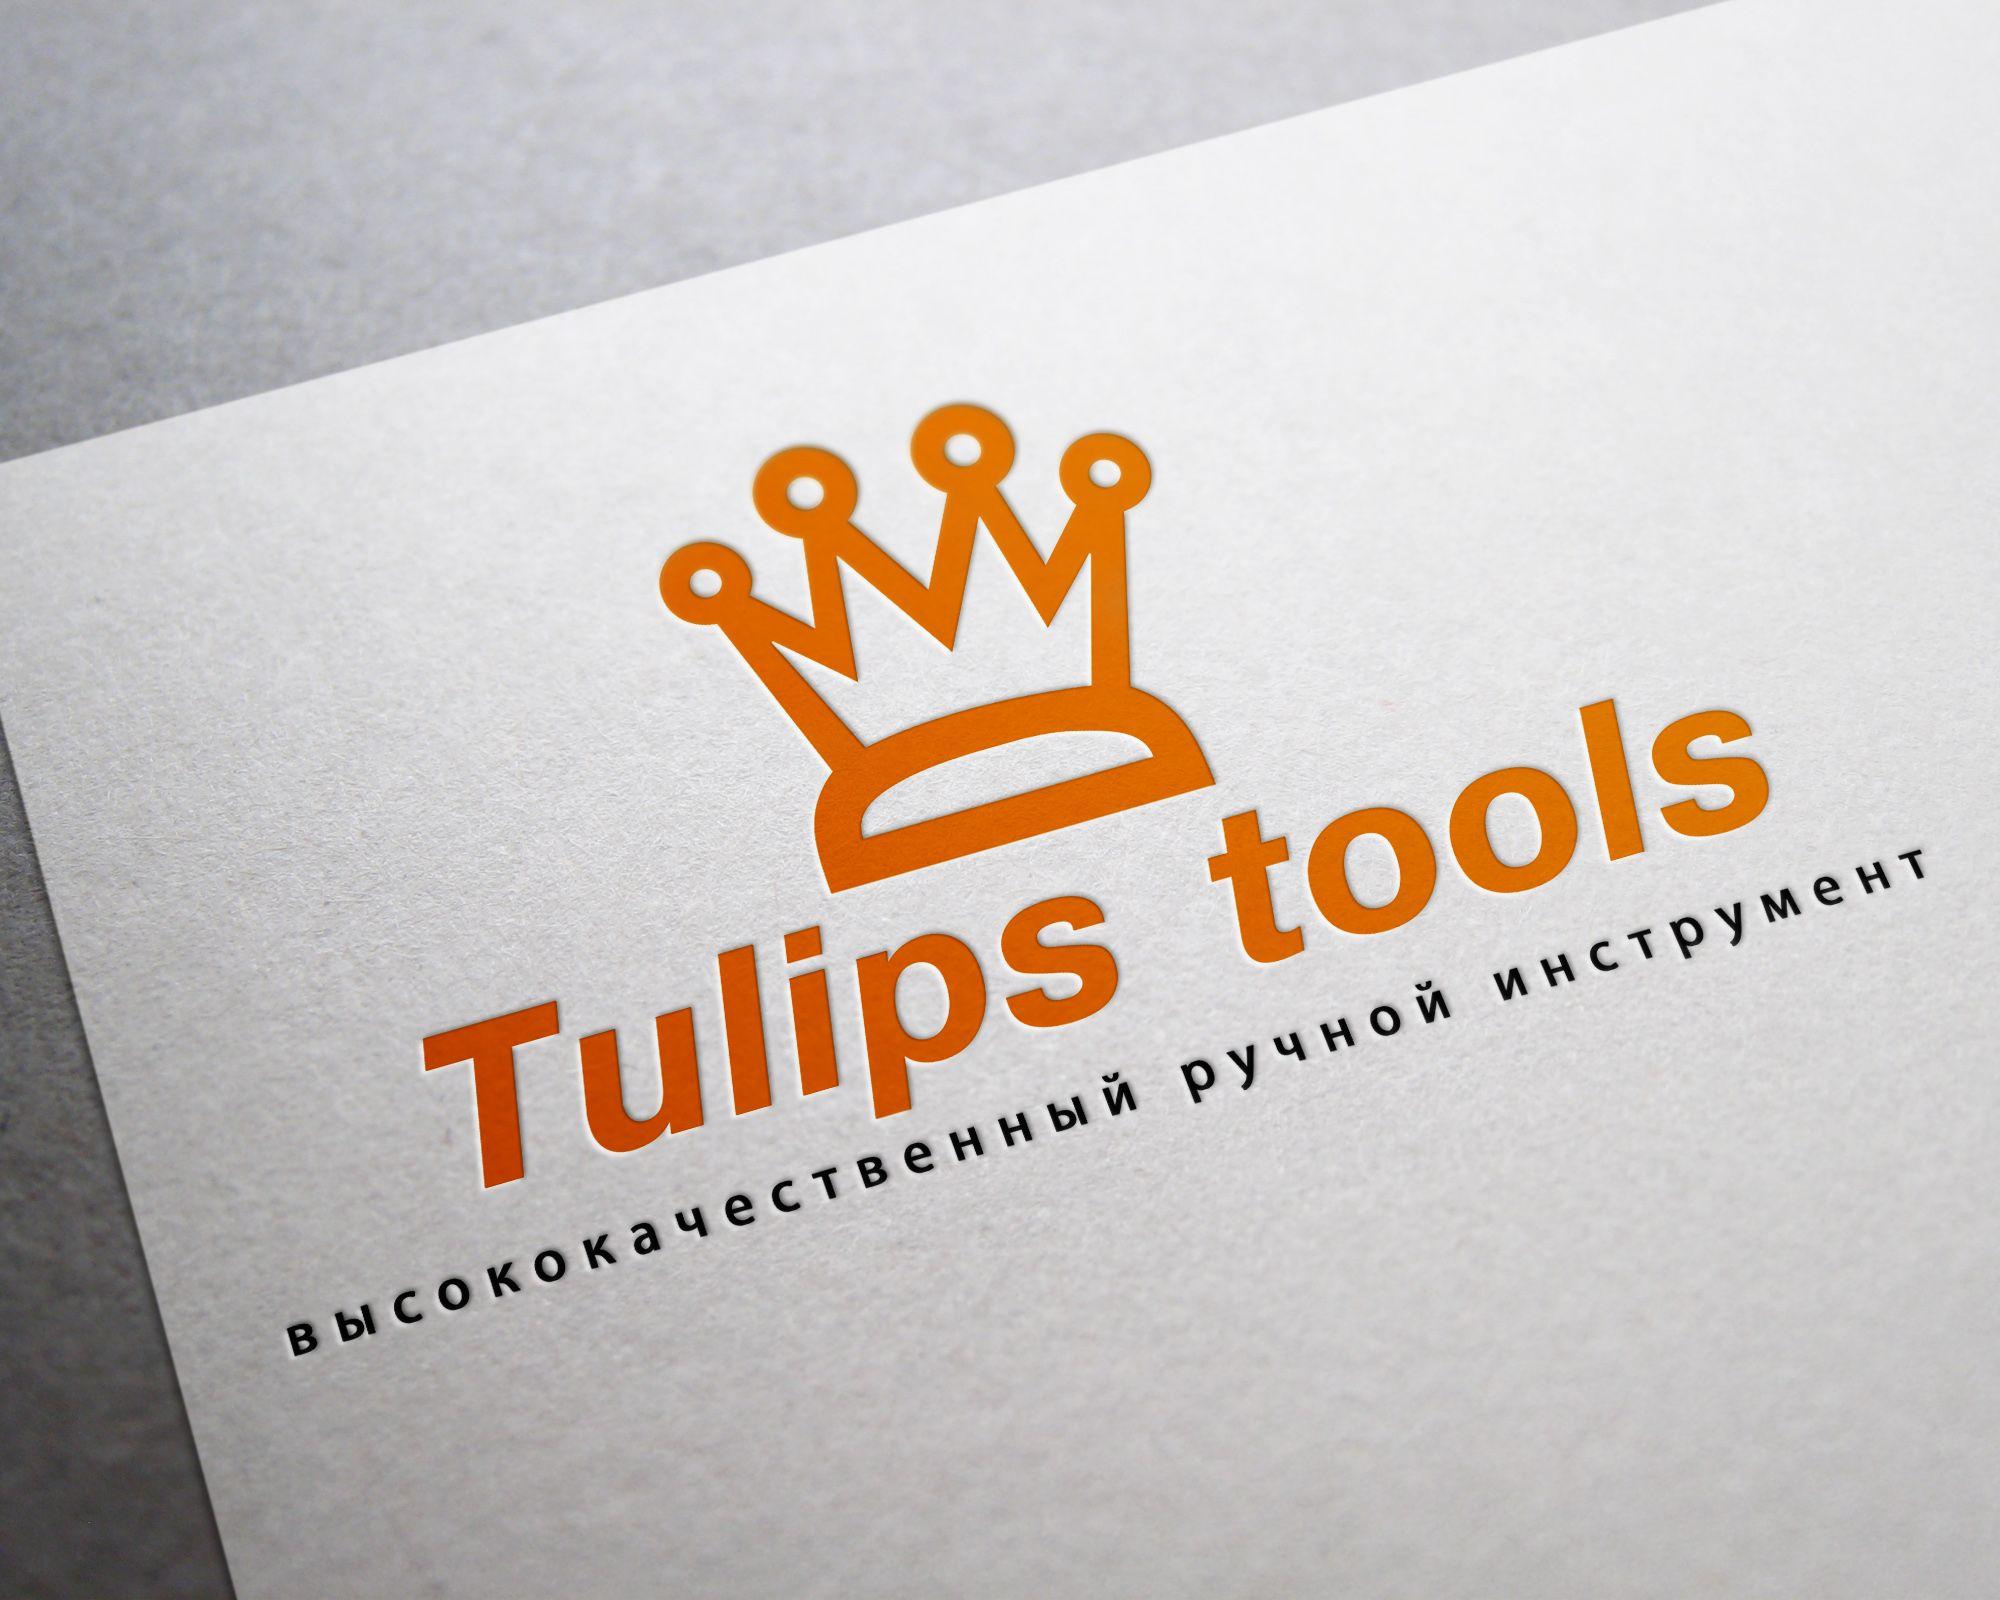 Tulips - дизайнер AikiS